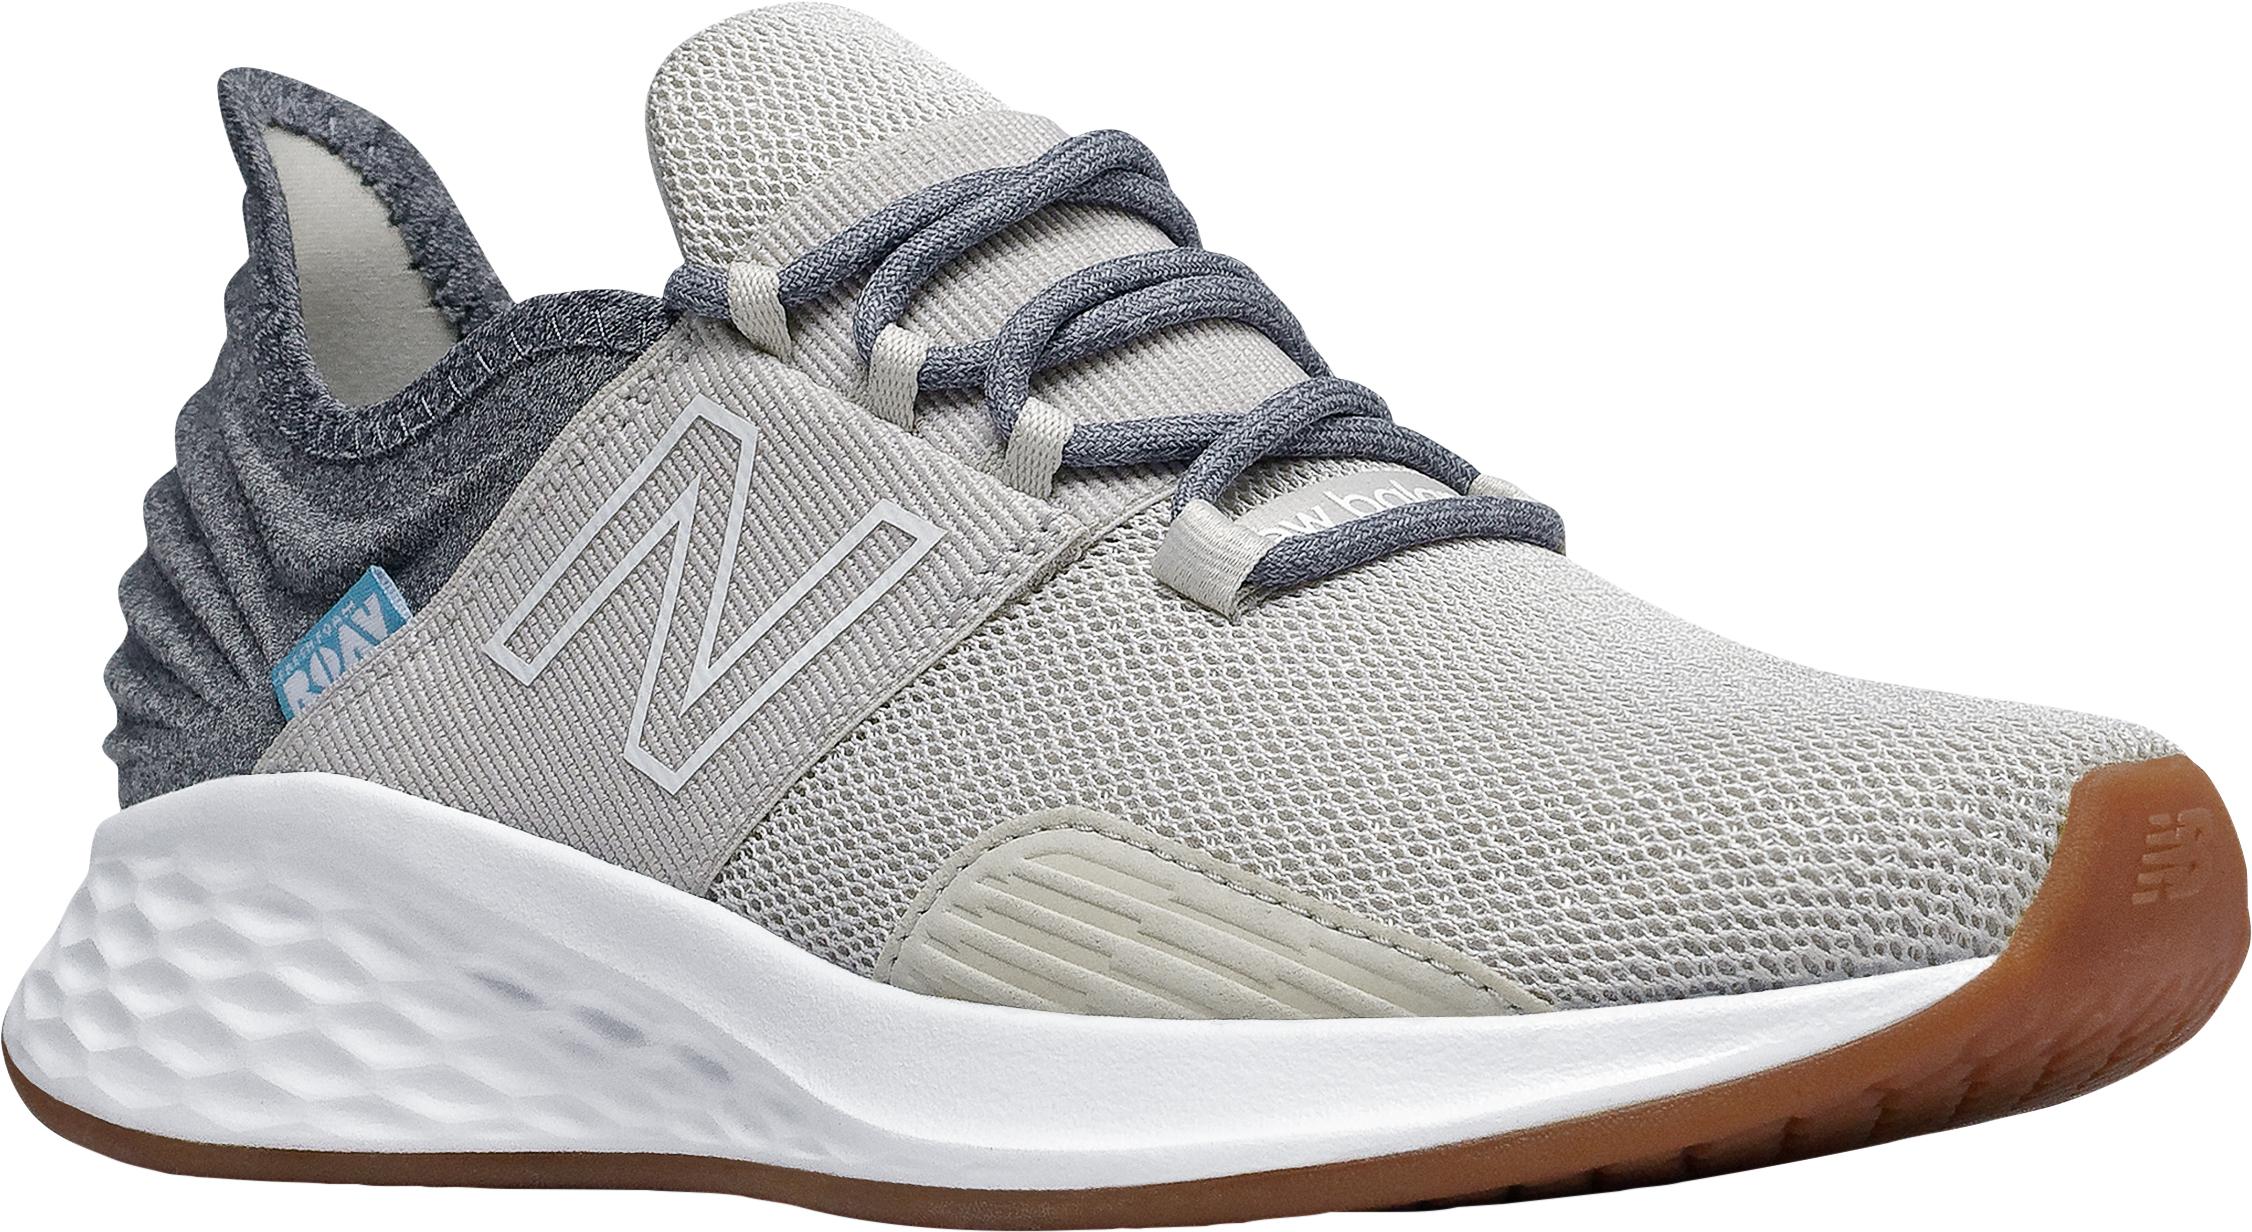 New Balance Fresh Foam Roav Shoes